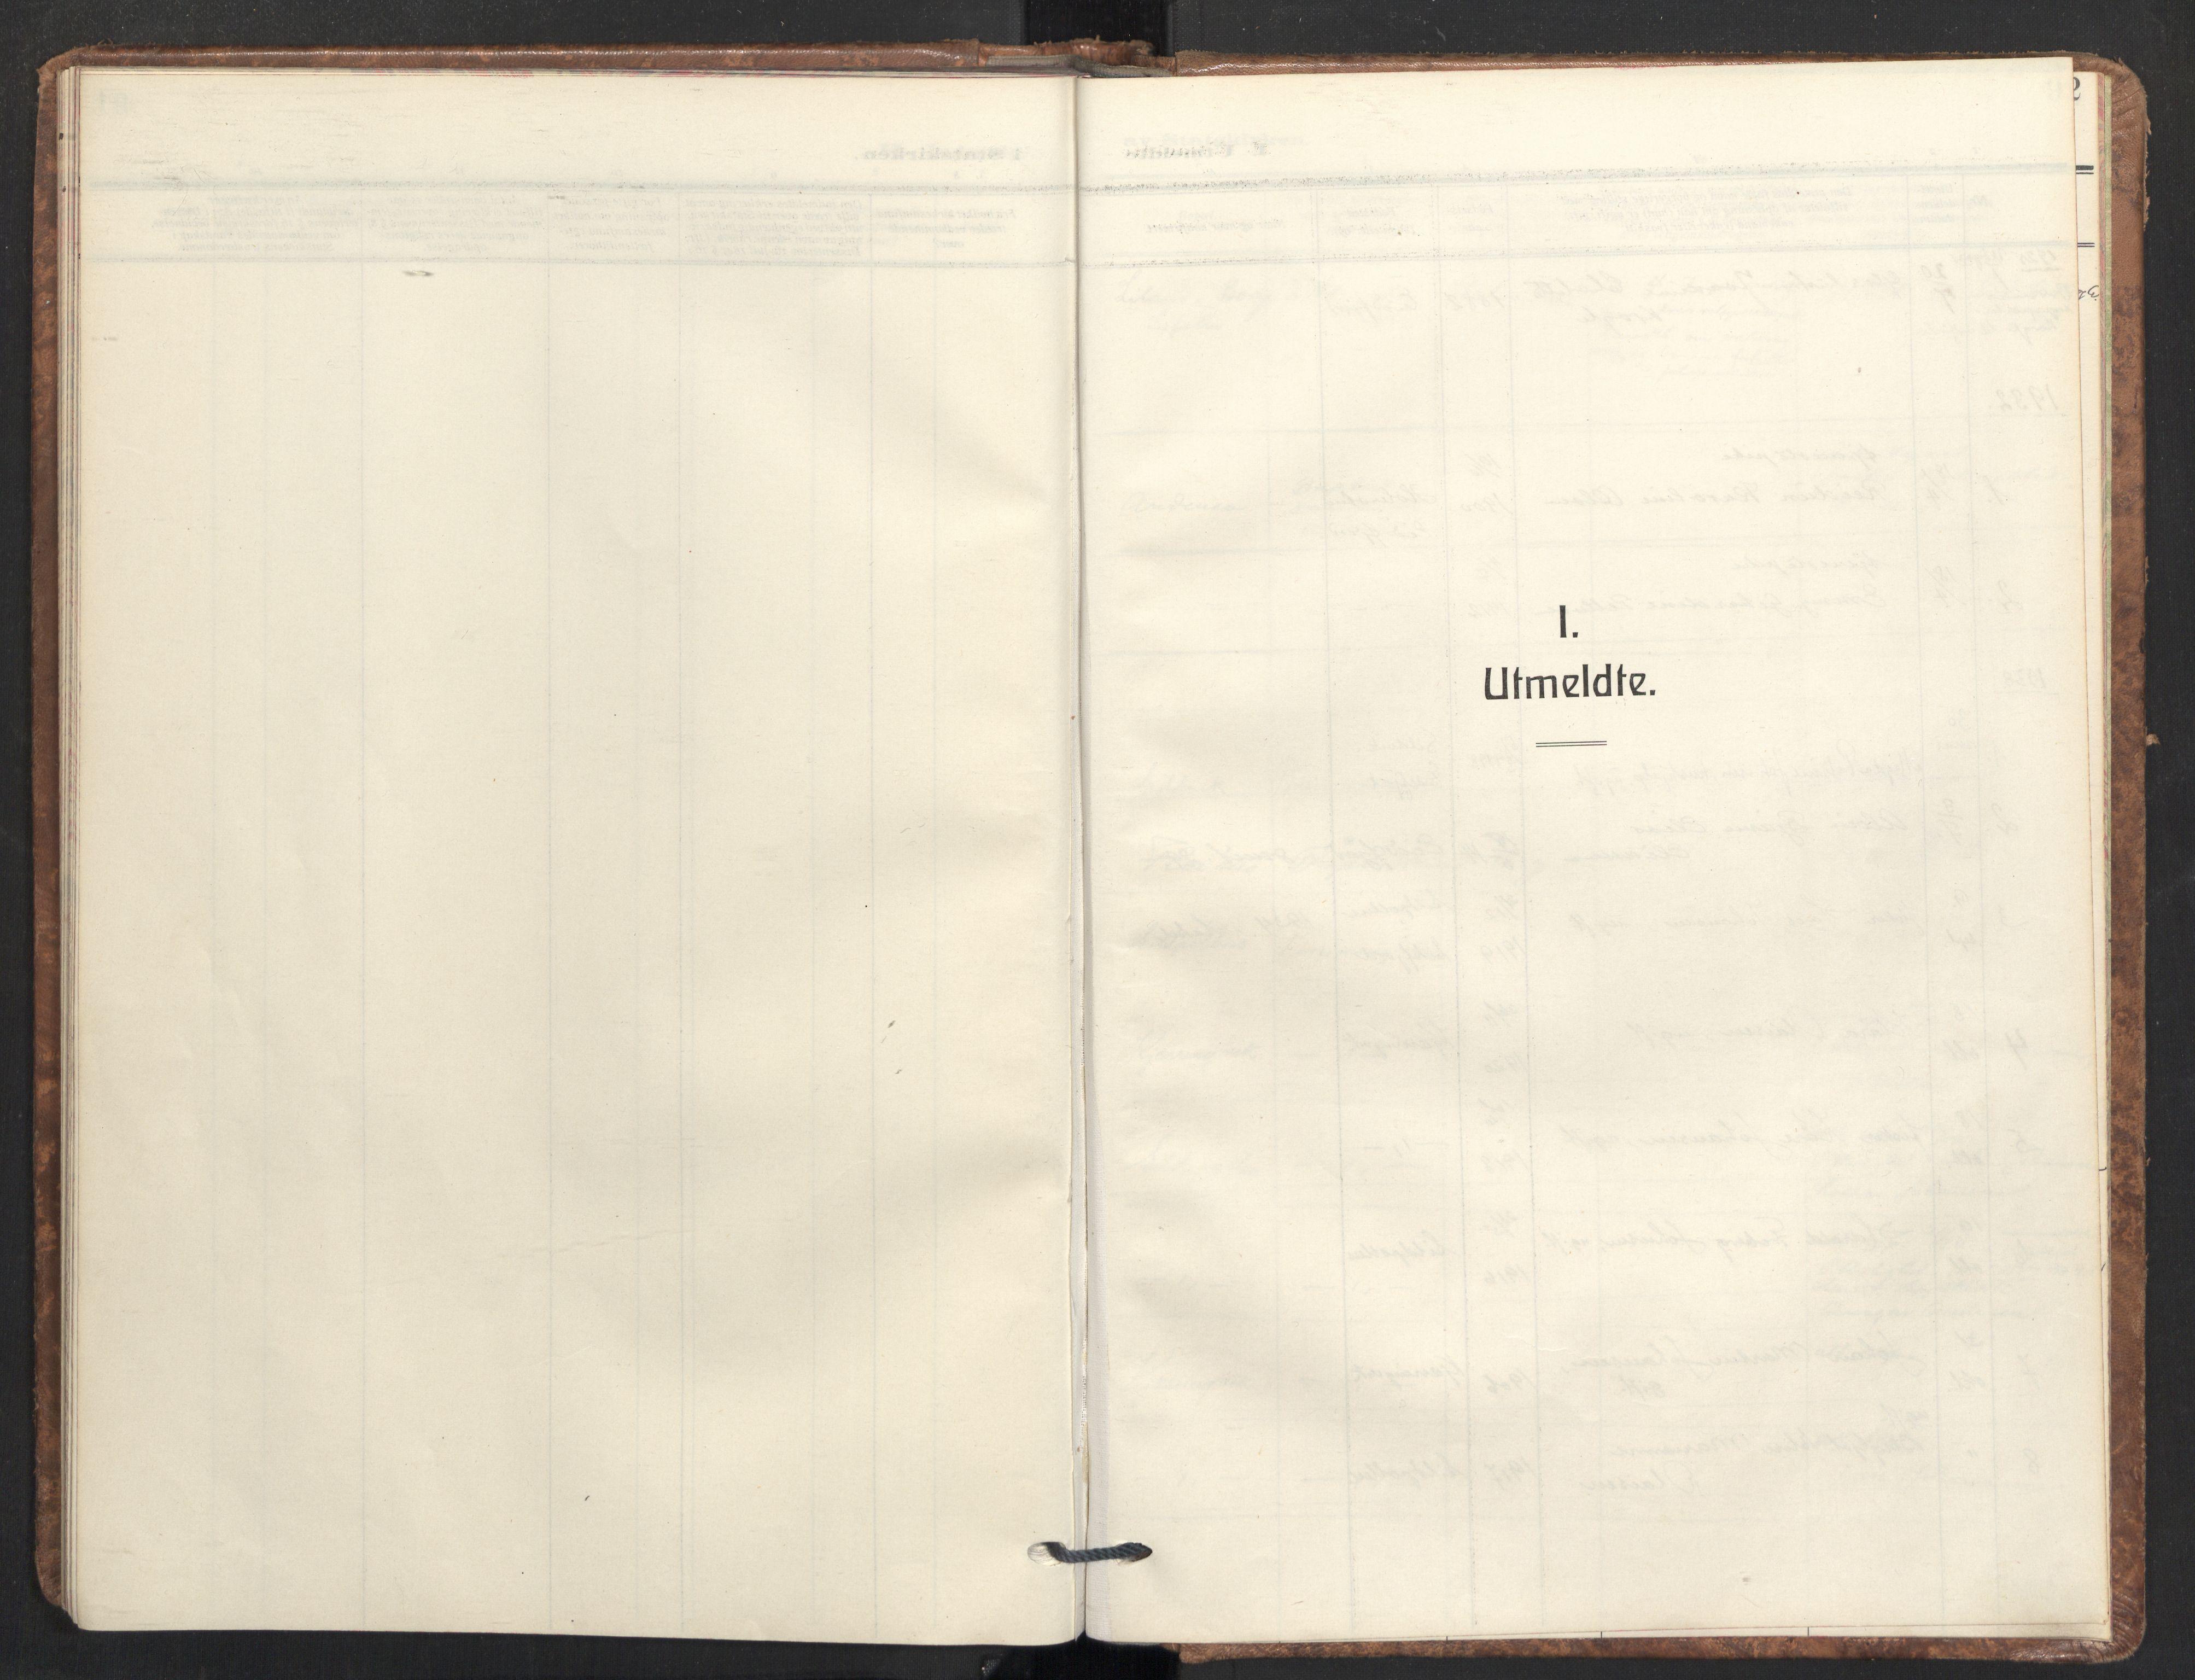 SAT, Ministerialprotokoller, klokkerbøker og fødselsregistre - Nordland, 890/L1289: Ministerialbok nr. 890A04, 1925-1939